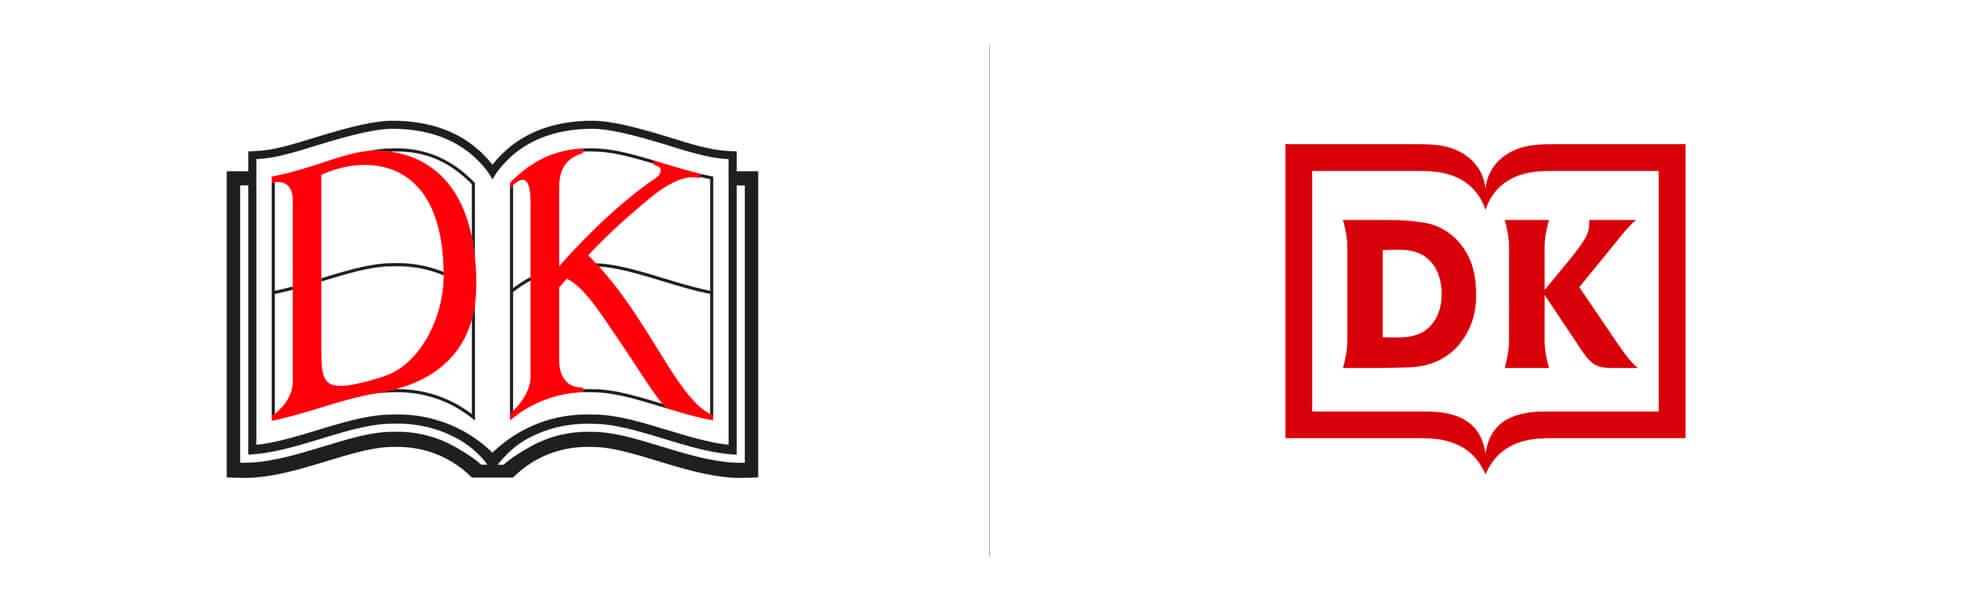 Dorling Kindersley znowym logo